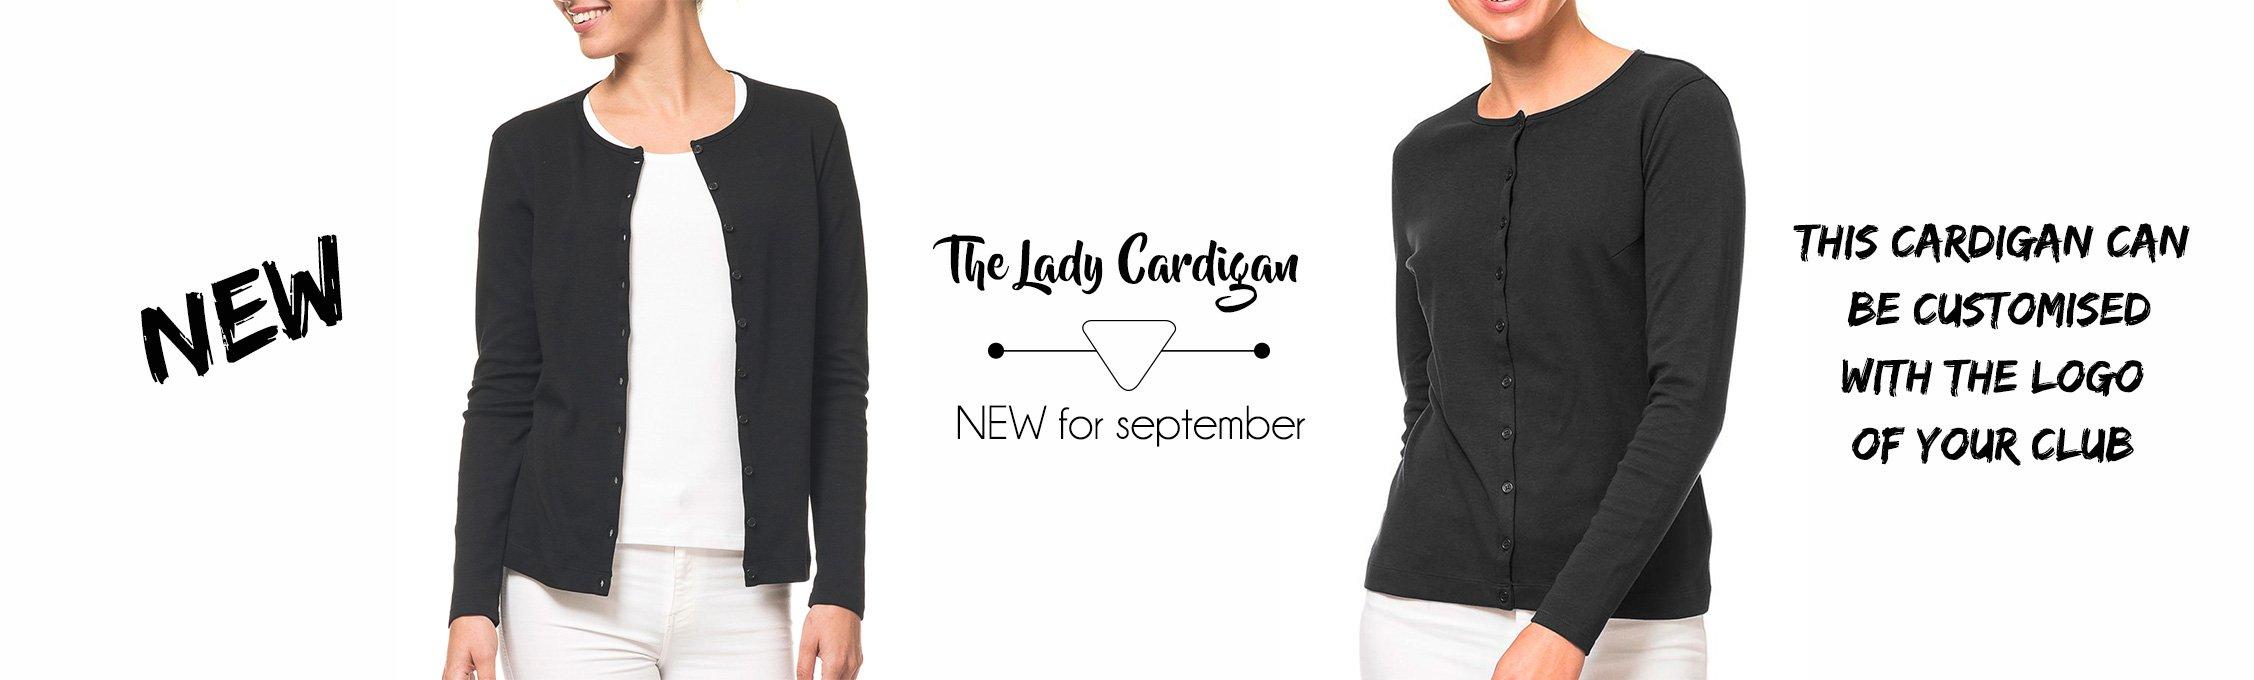 The lady cardigan